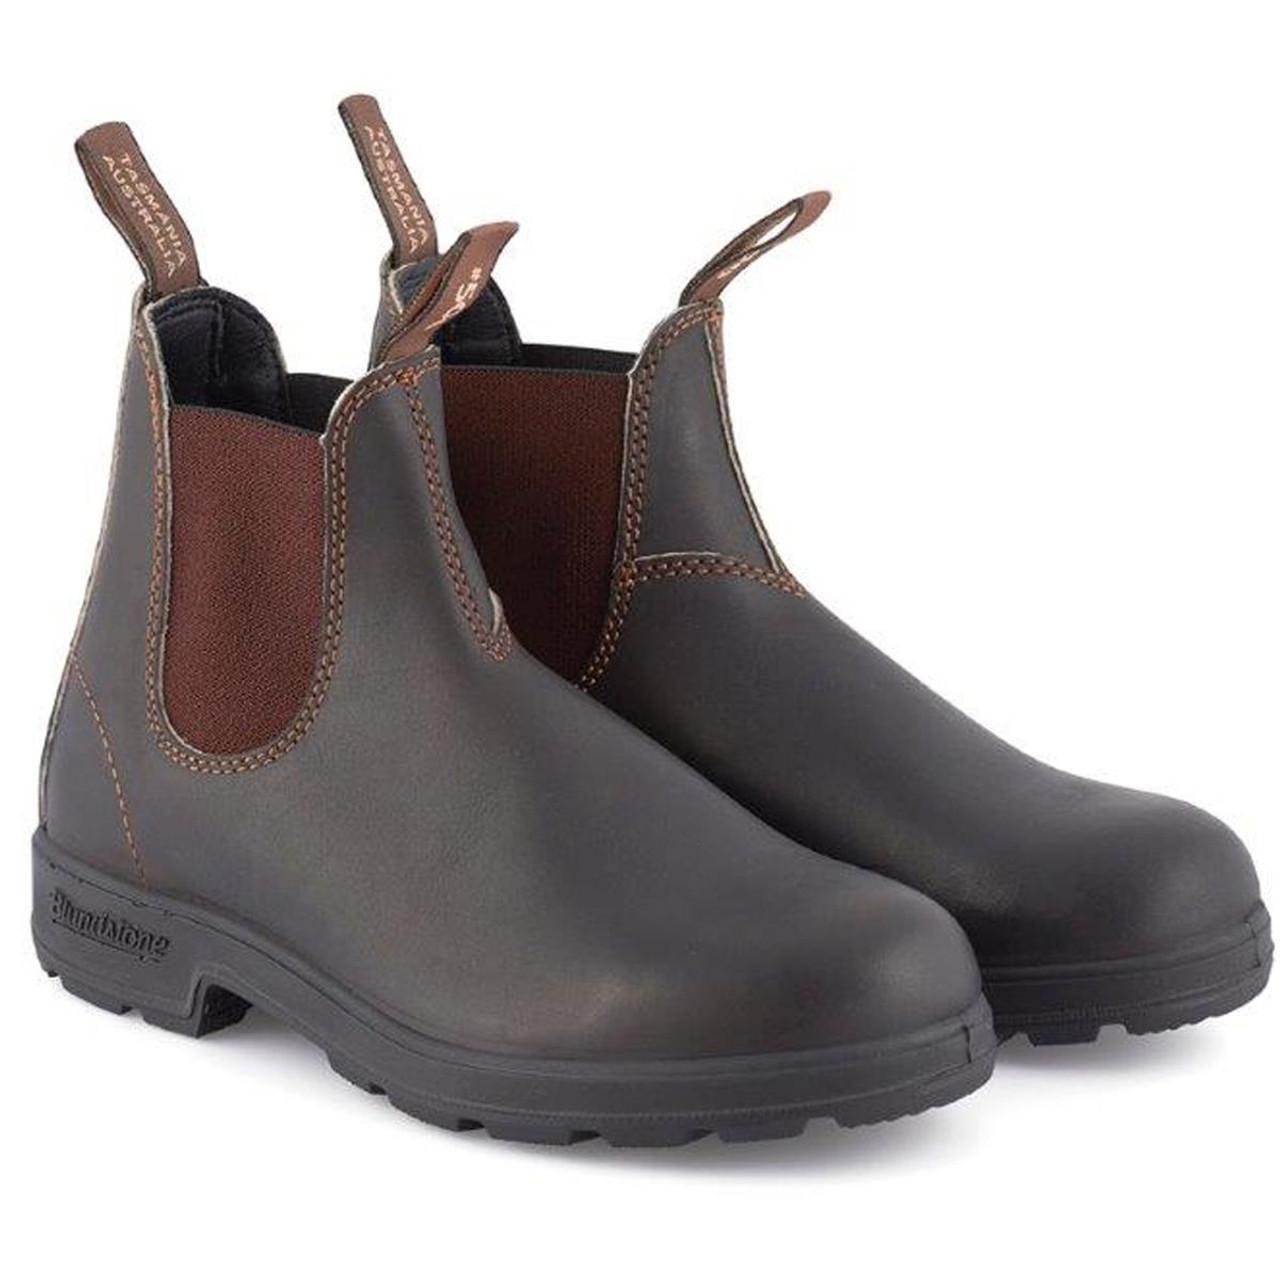 Blundstone Unisex Originals 500 Chelsea Boot